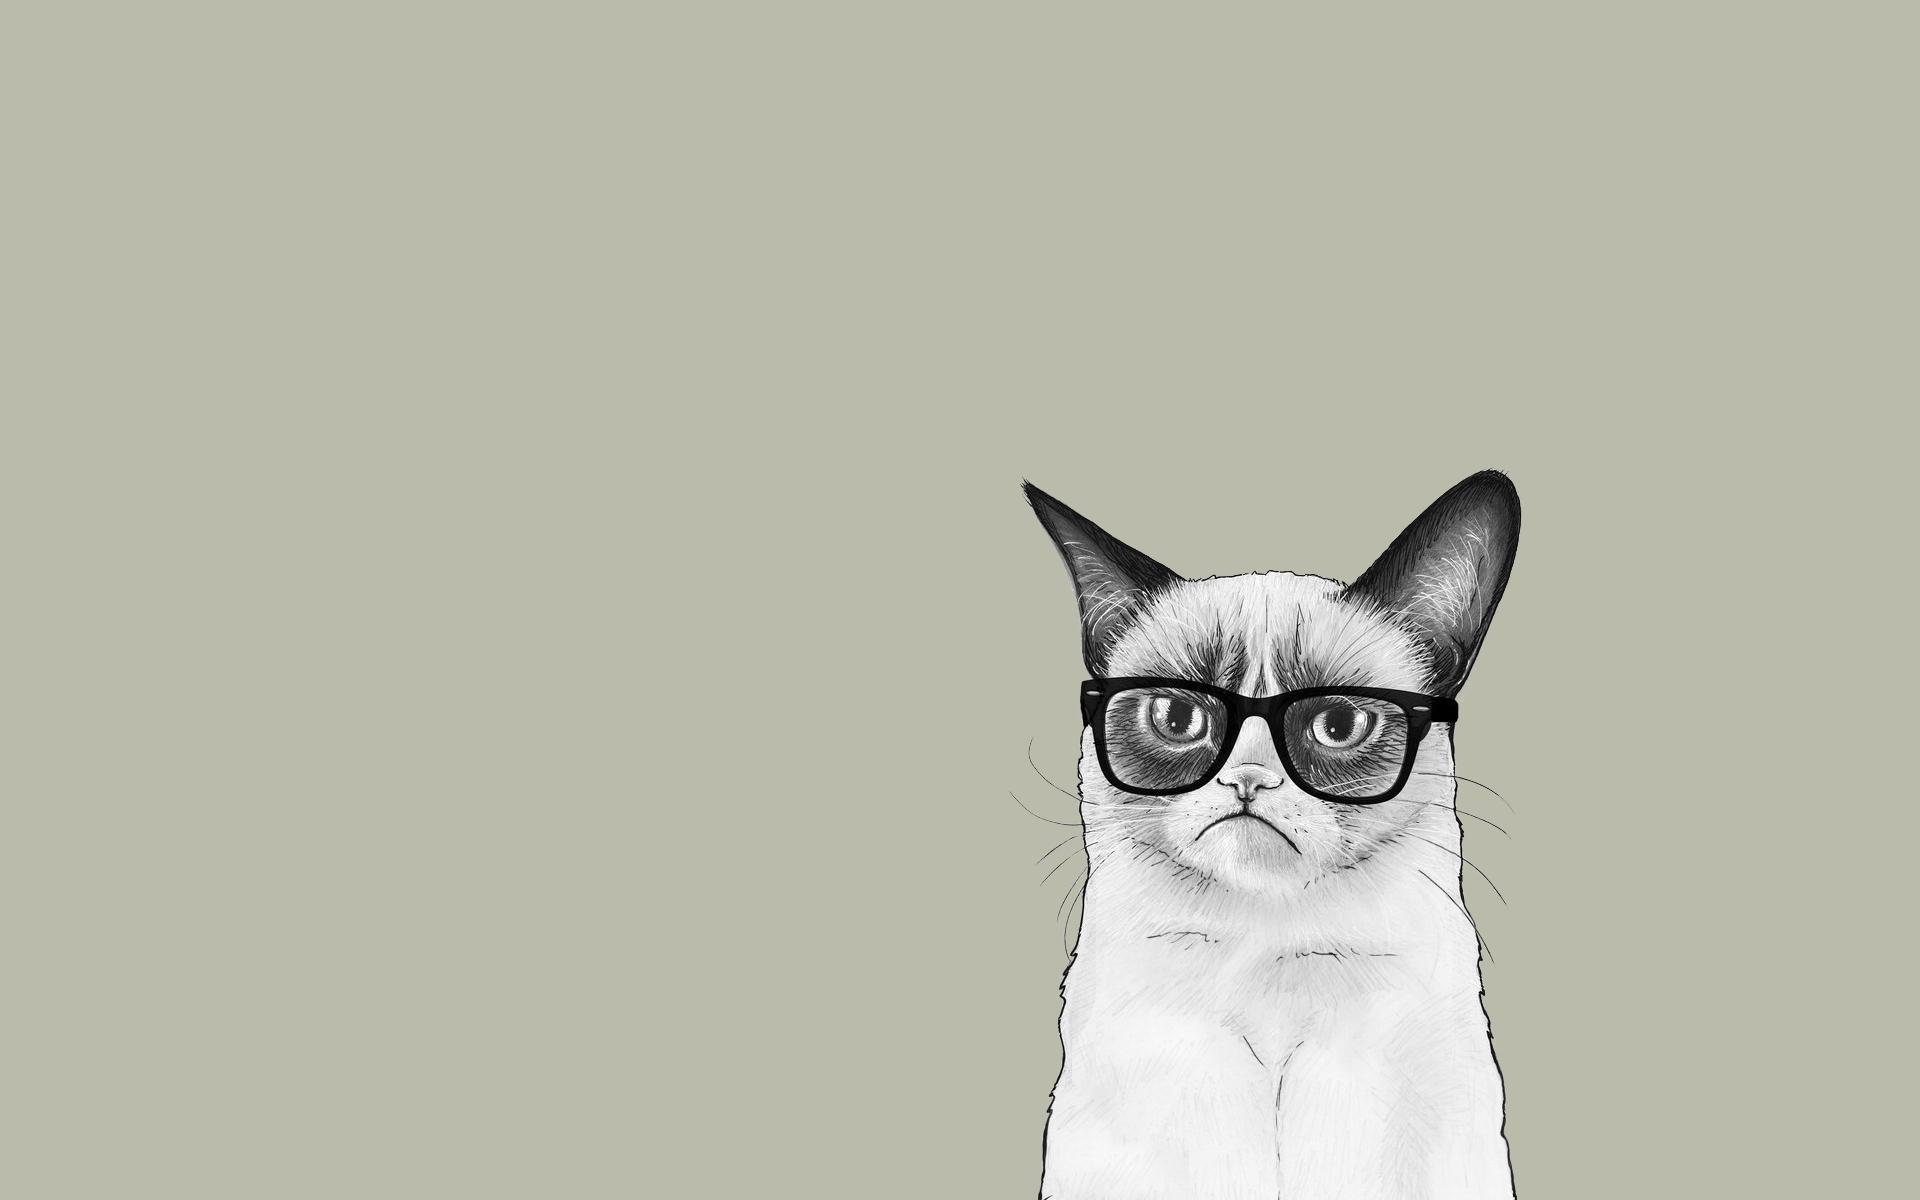 art cat monotype glasses discomfort minimalist wallpaper 1920x1200